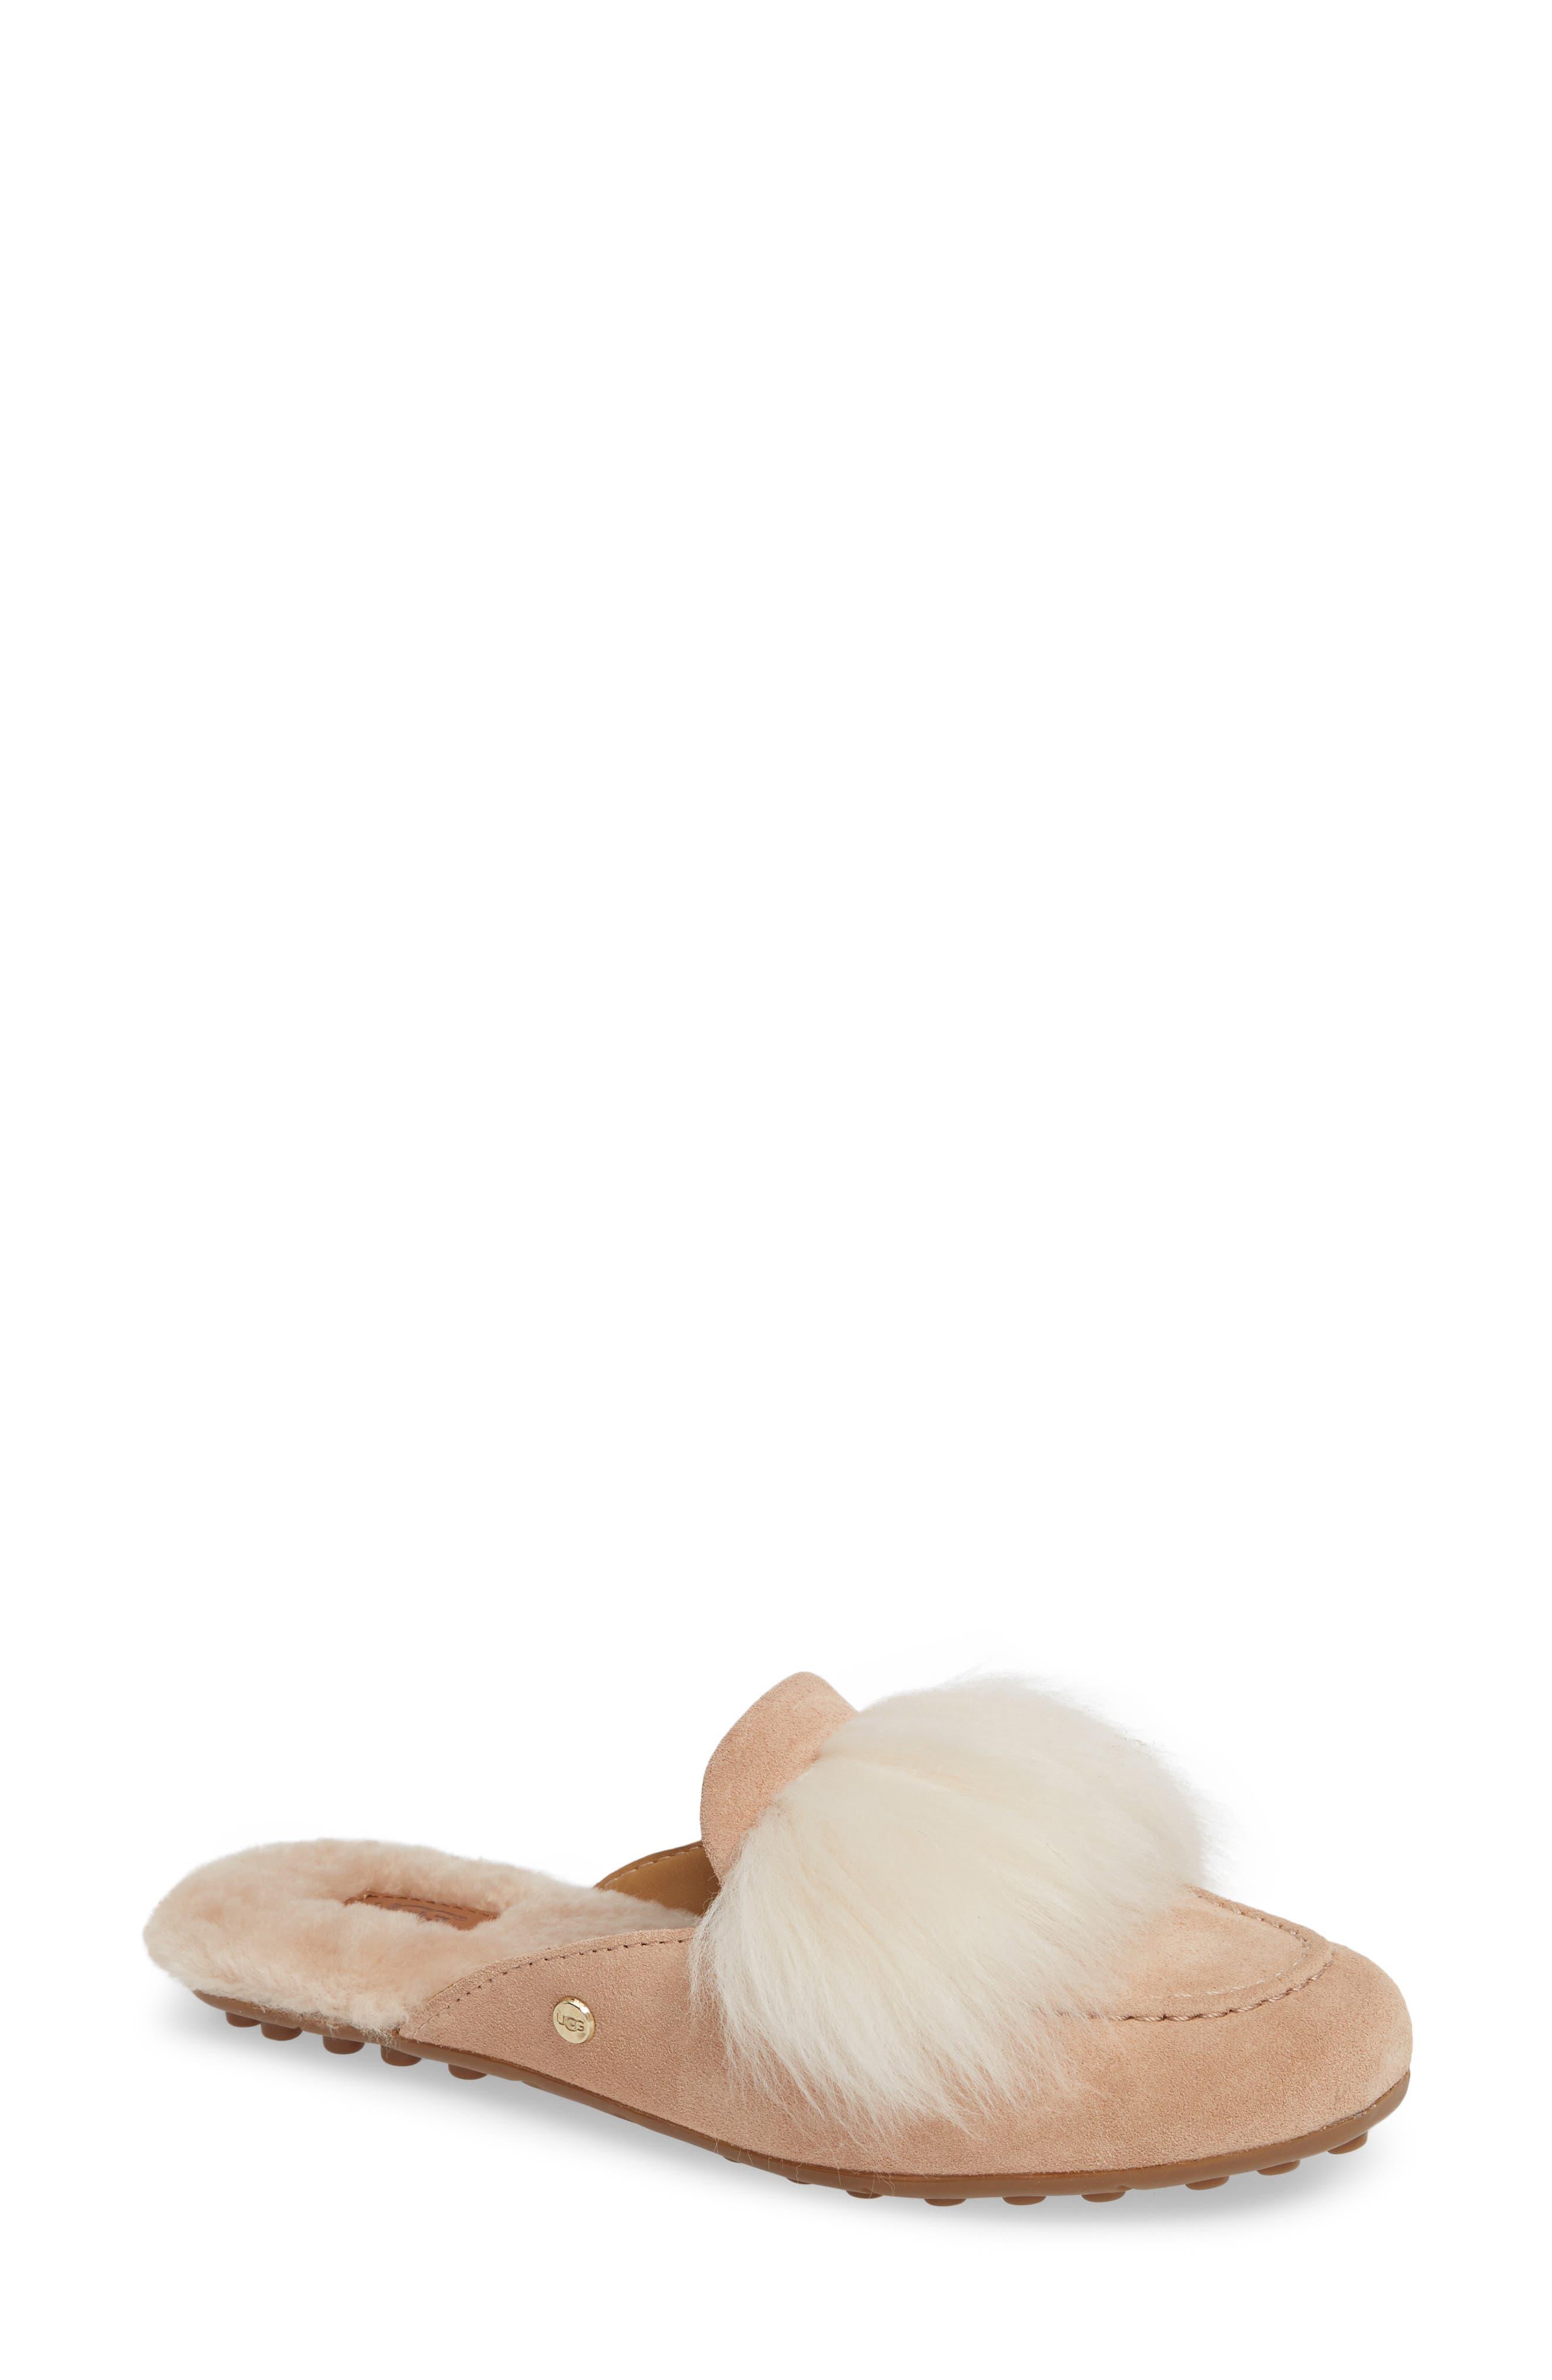 Ugg Shaine Wisp Genuine Shearling Slipper, Pink